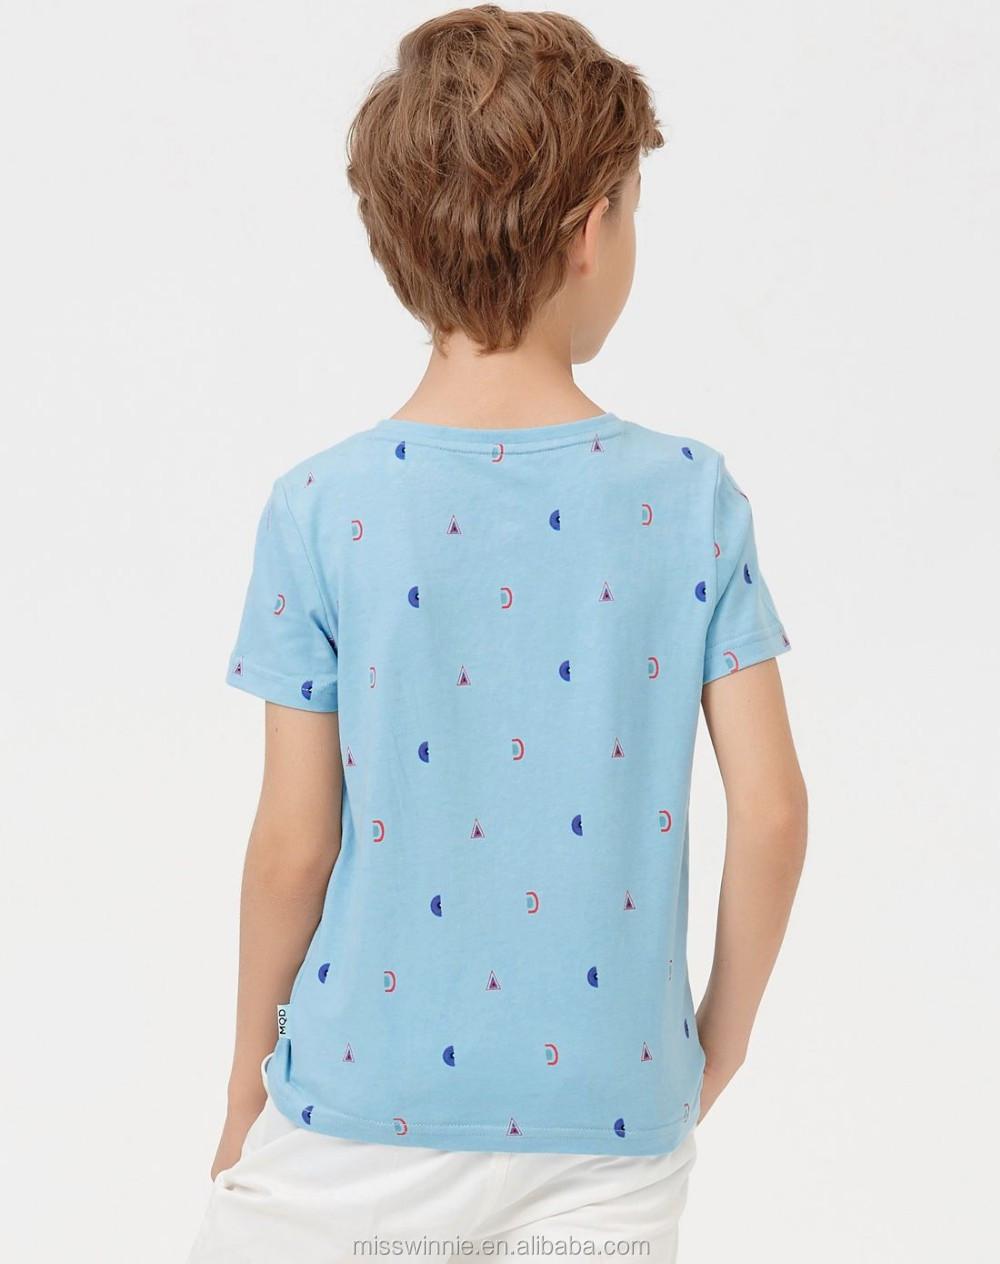 307bb59cb186 kids wear new model summer boys clothes comfortable boys light blue t-shirt